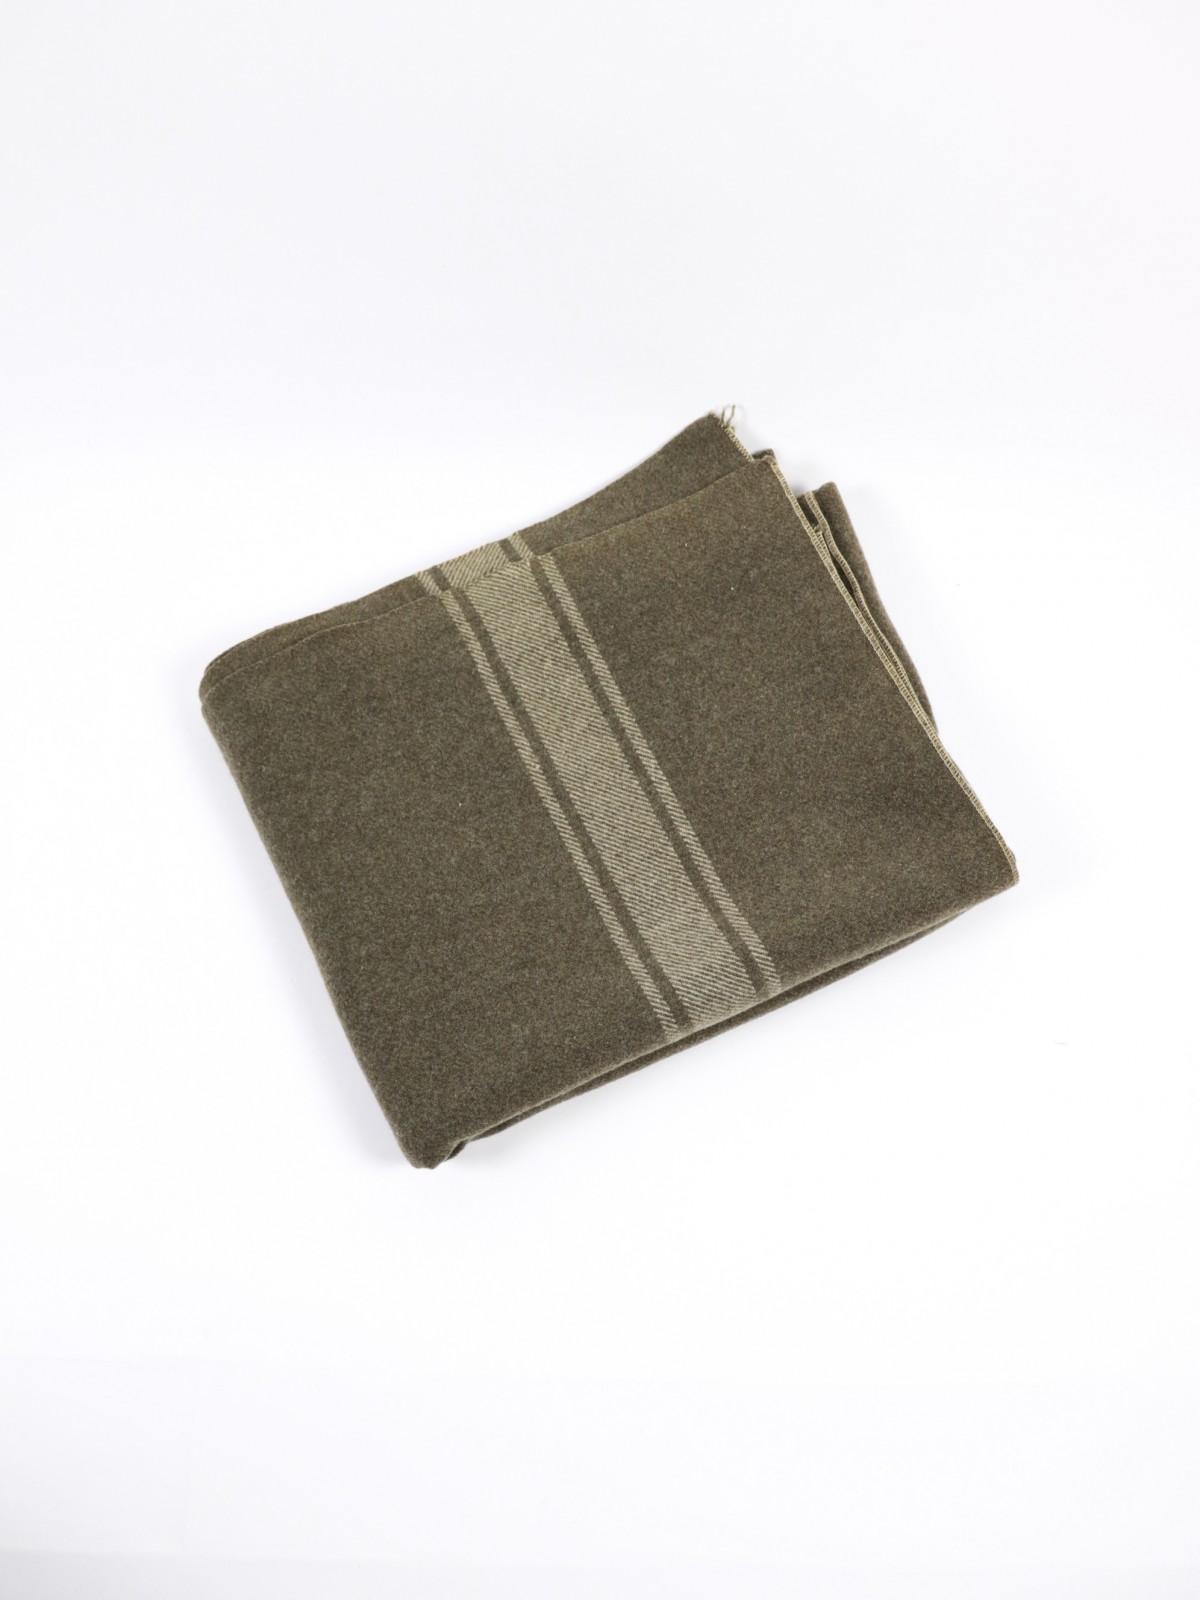 Italian military blanket